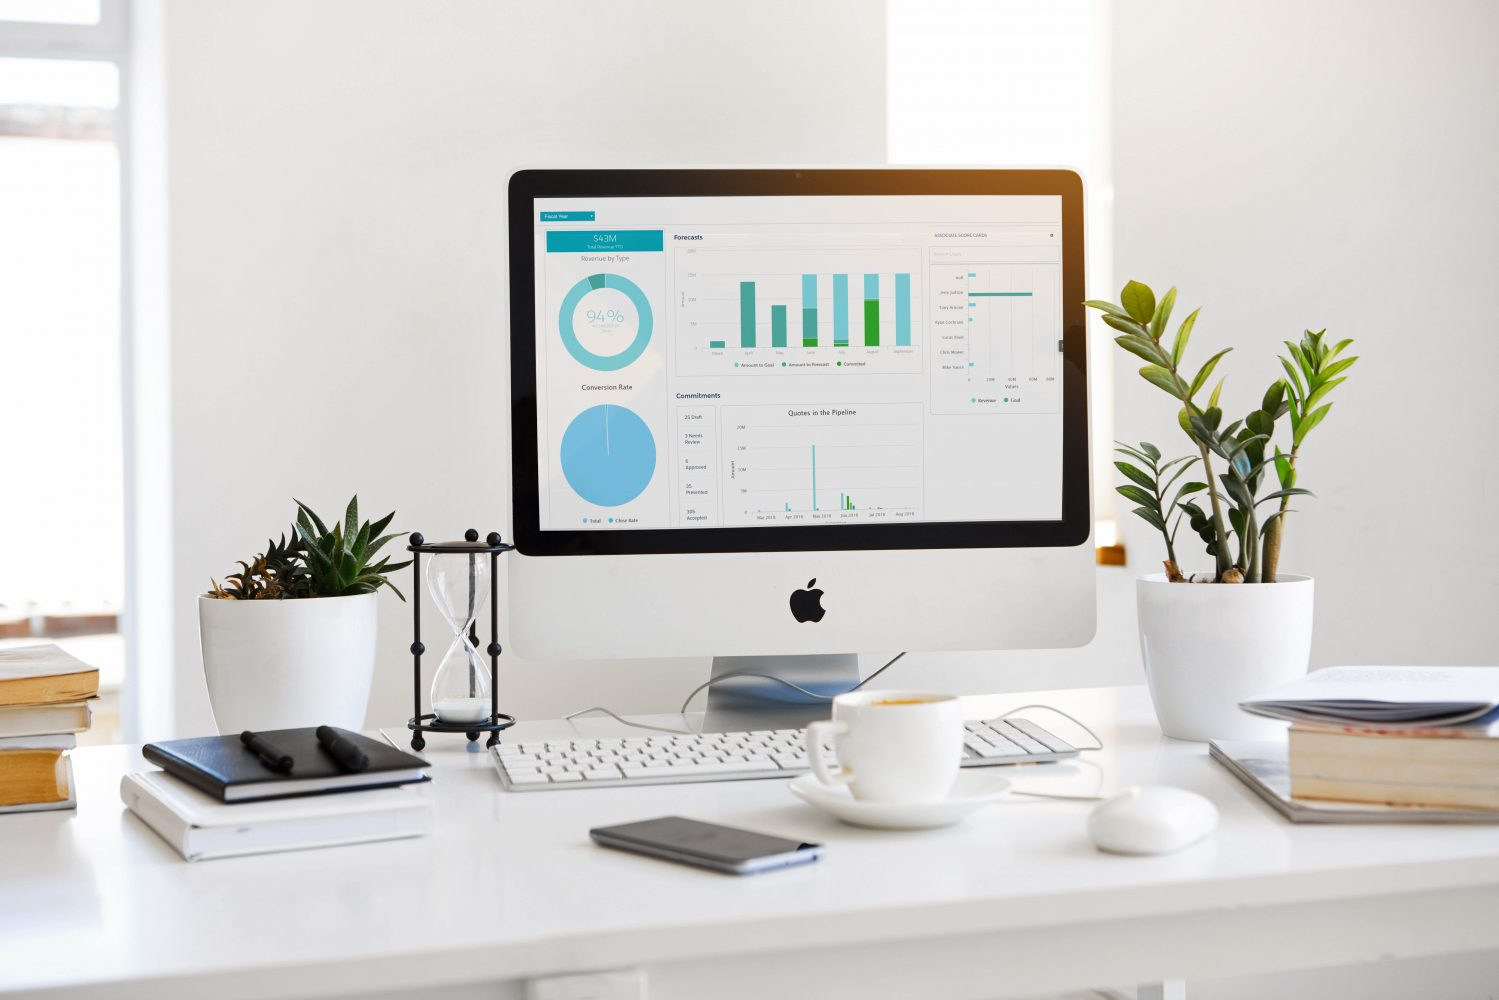 iMac computer on a modern desk